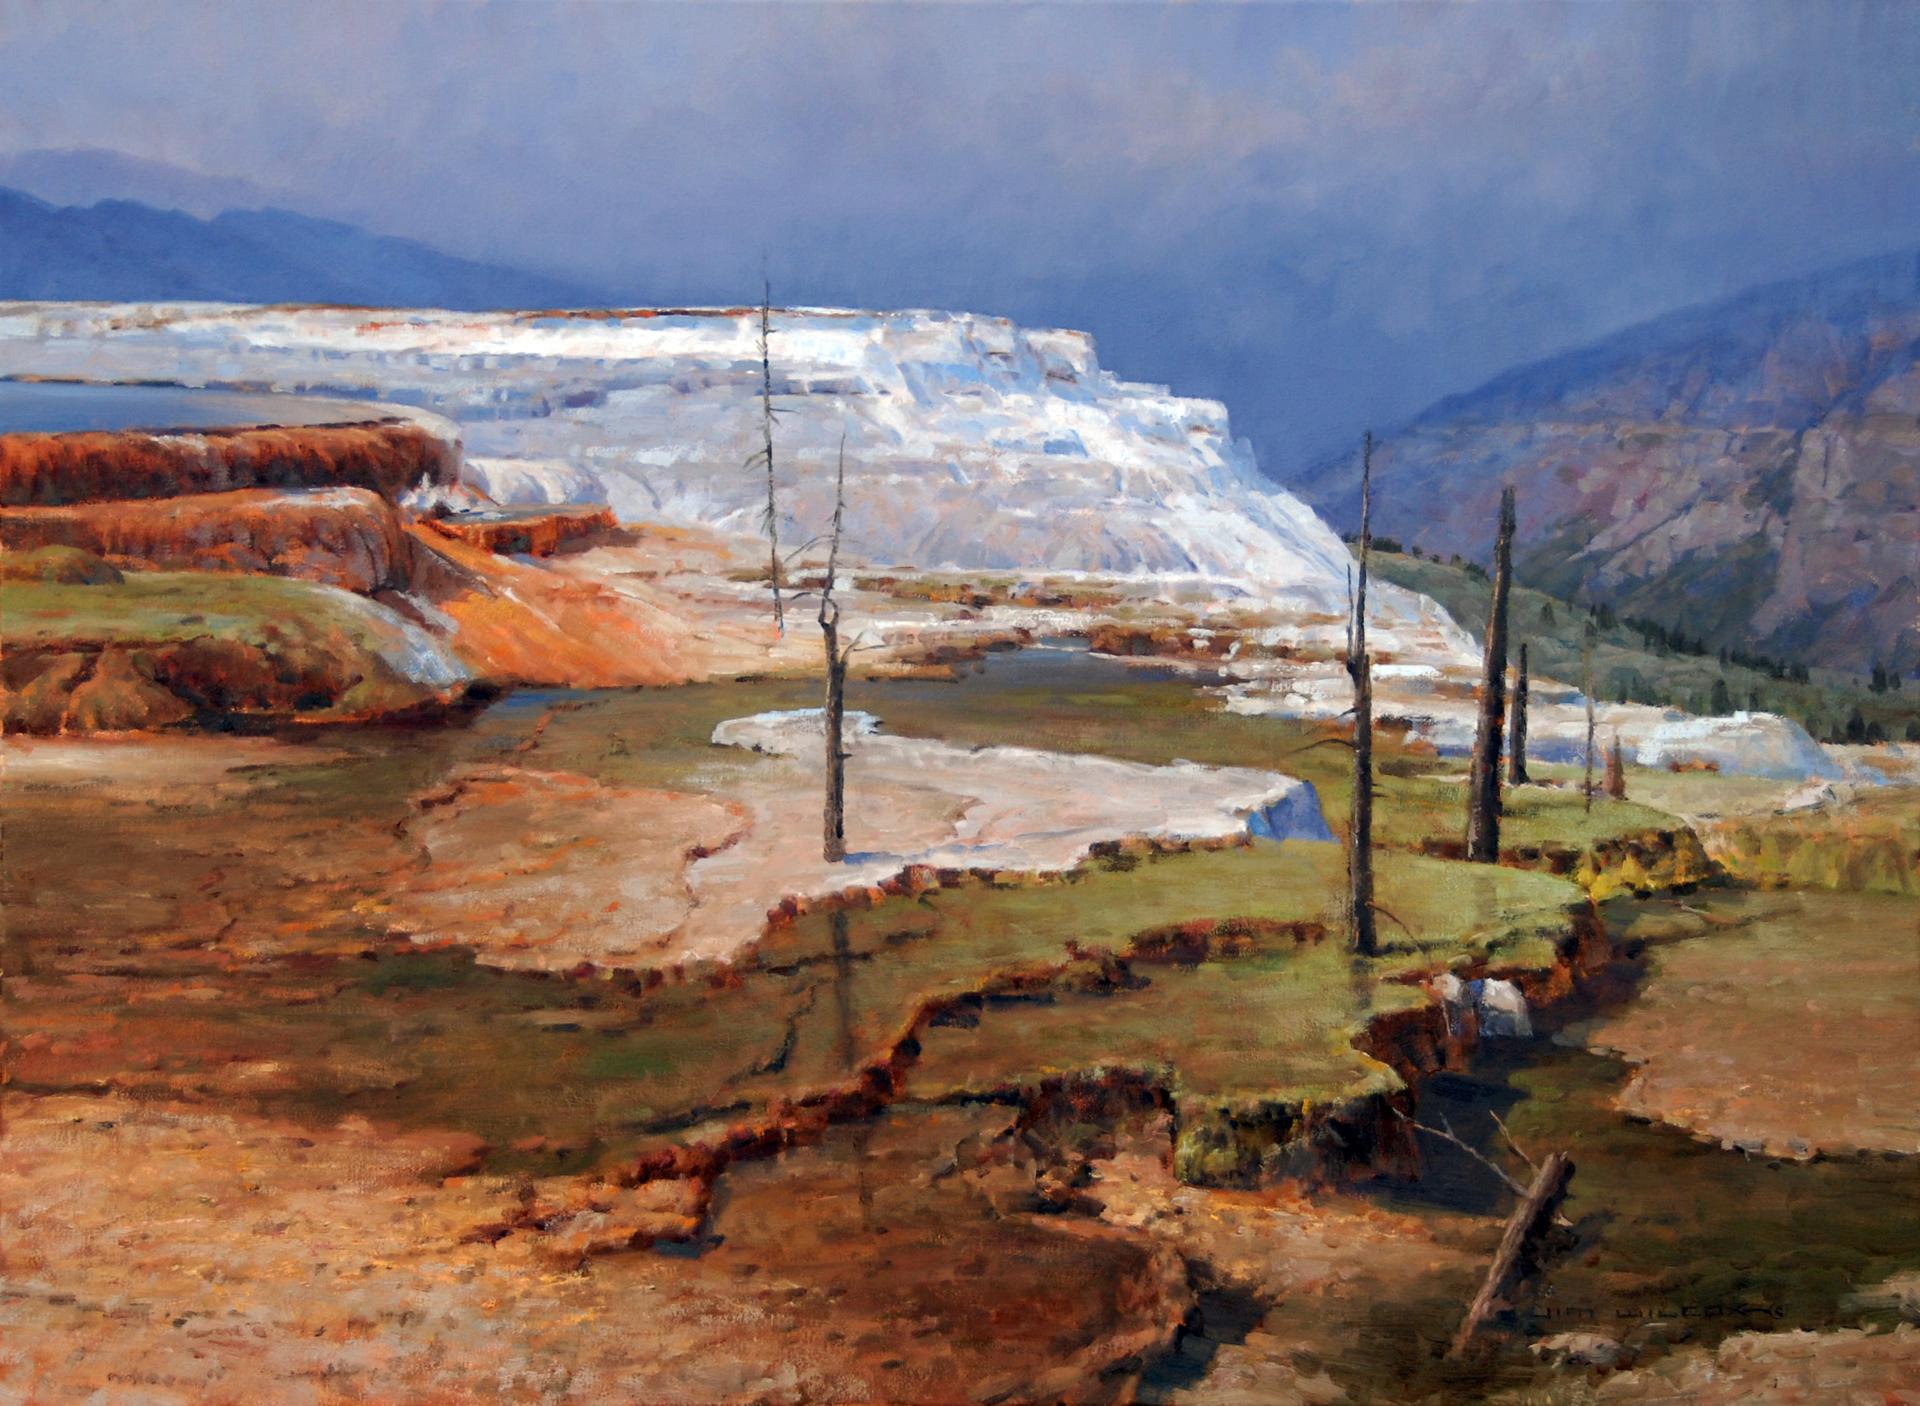 Travertine Terrace by Jim Wilcox